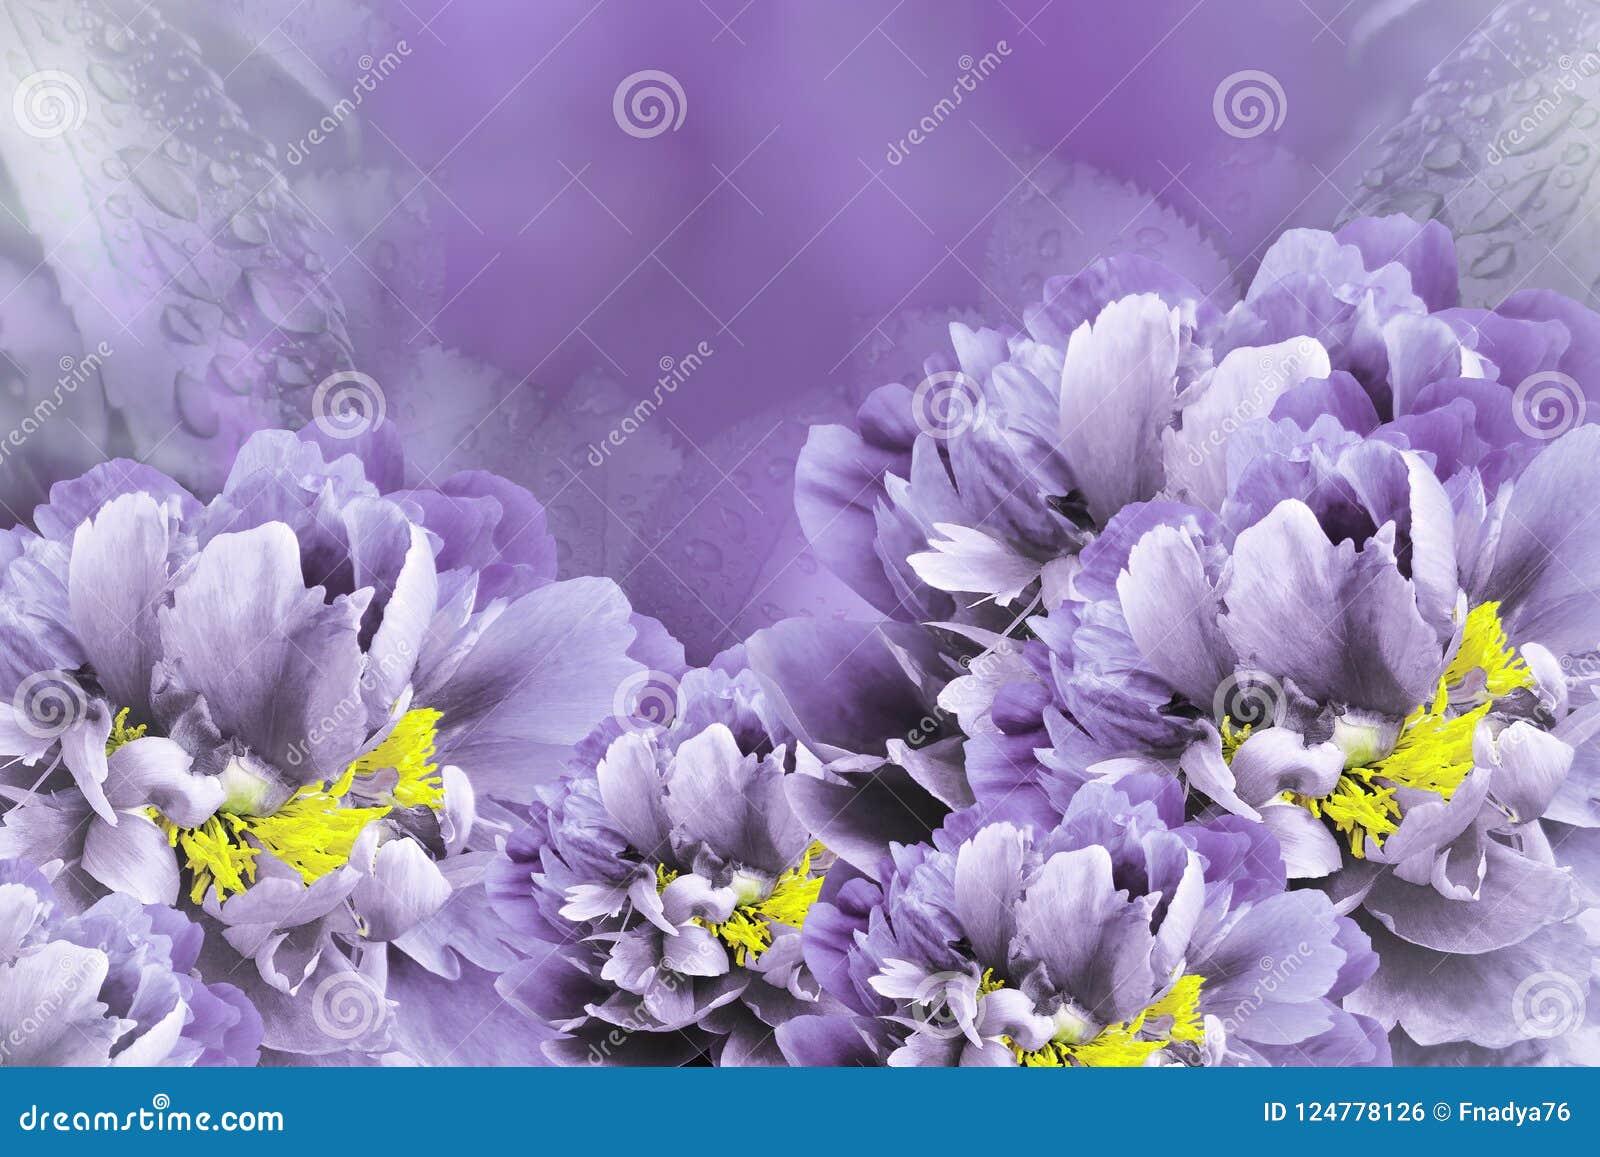 Floral background violet peonies flowers close up on a purple download floral background violet peonies flowers close up on a purple background flower mightylinksfo